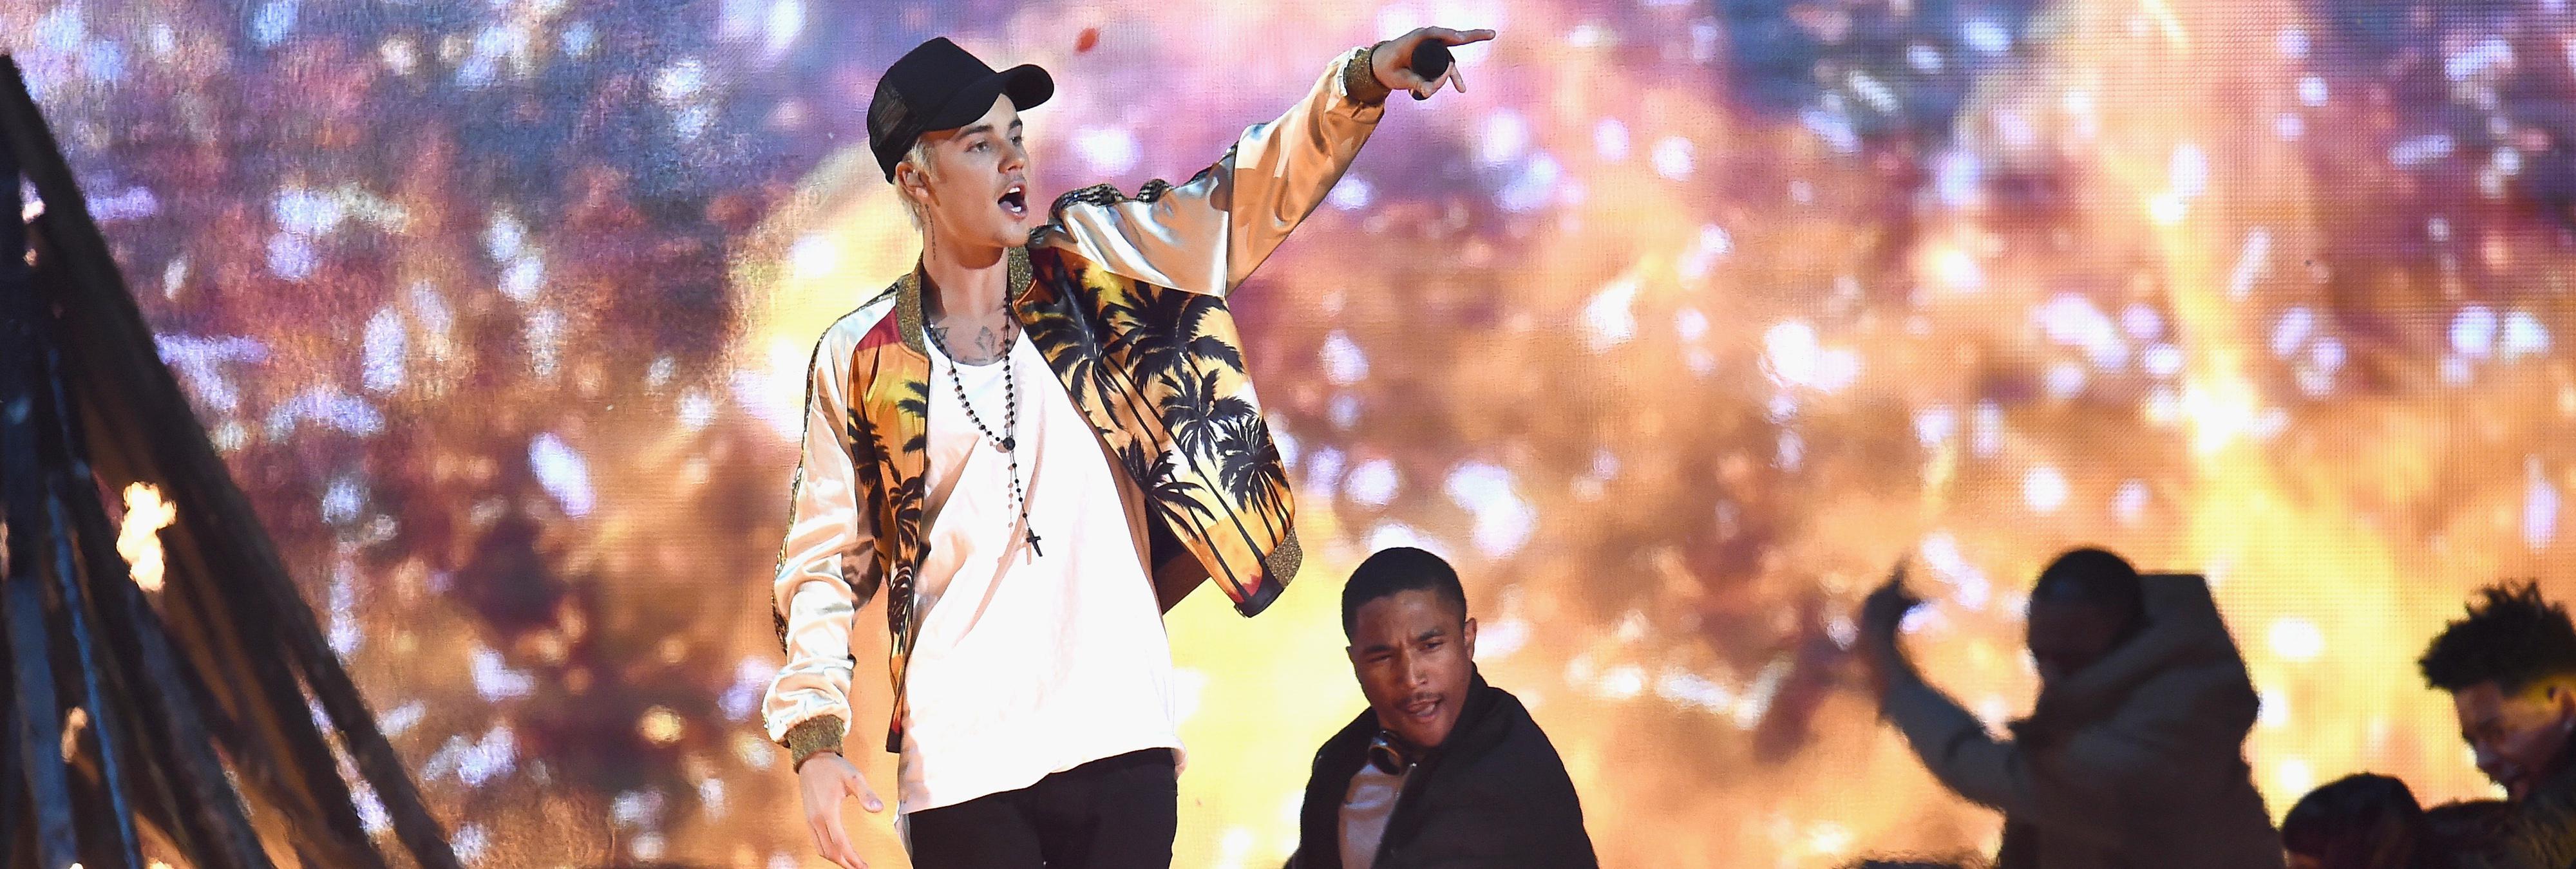 Justin Bieber será arrestado si viaja a Argentina